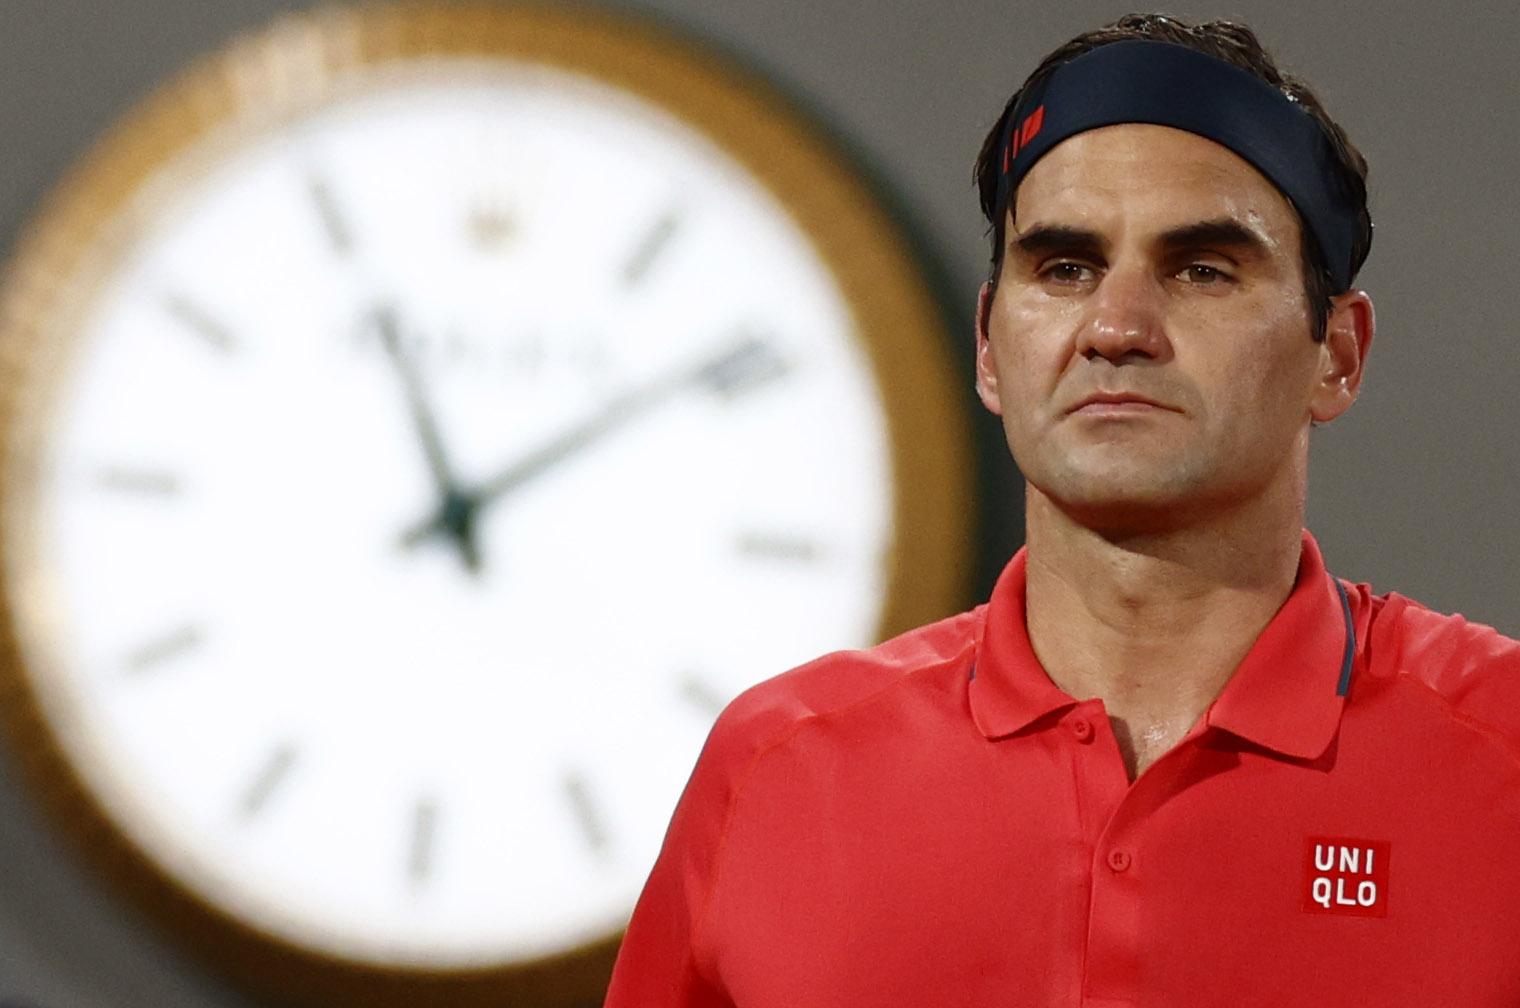 Tennis - French Open - Roland Garros, Paris, France - June 5, 2021 Switzerland's Roger Federer  during his third round match against Germany's Dominik Koepfer REUTERS/Christian Hartmann